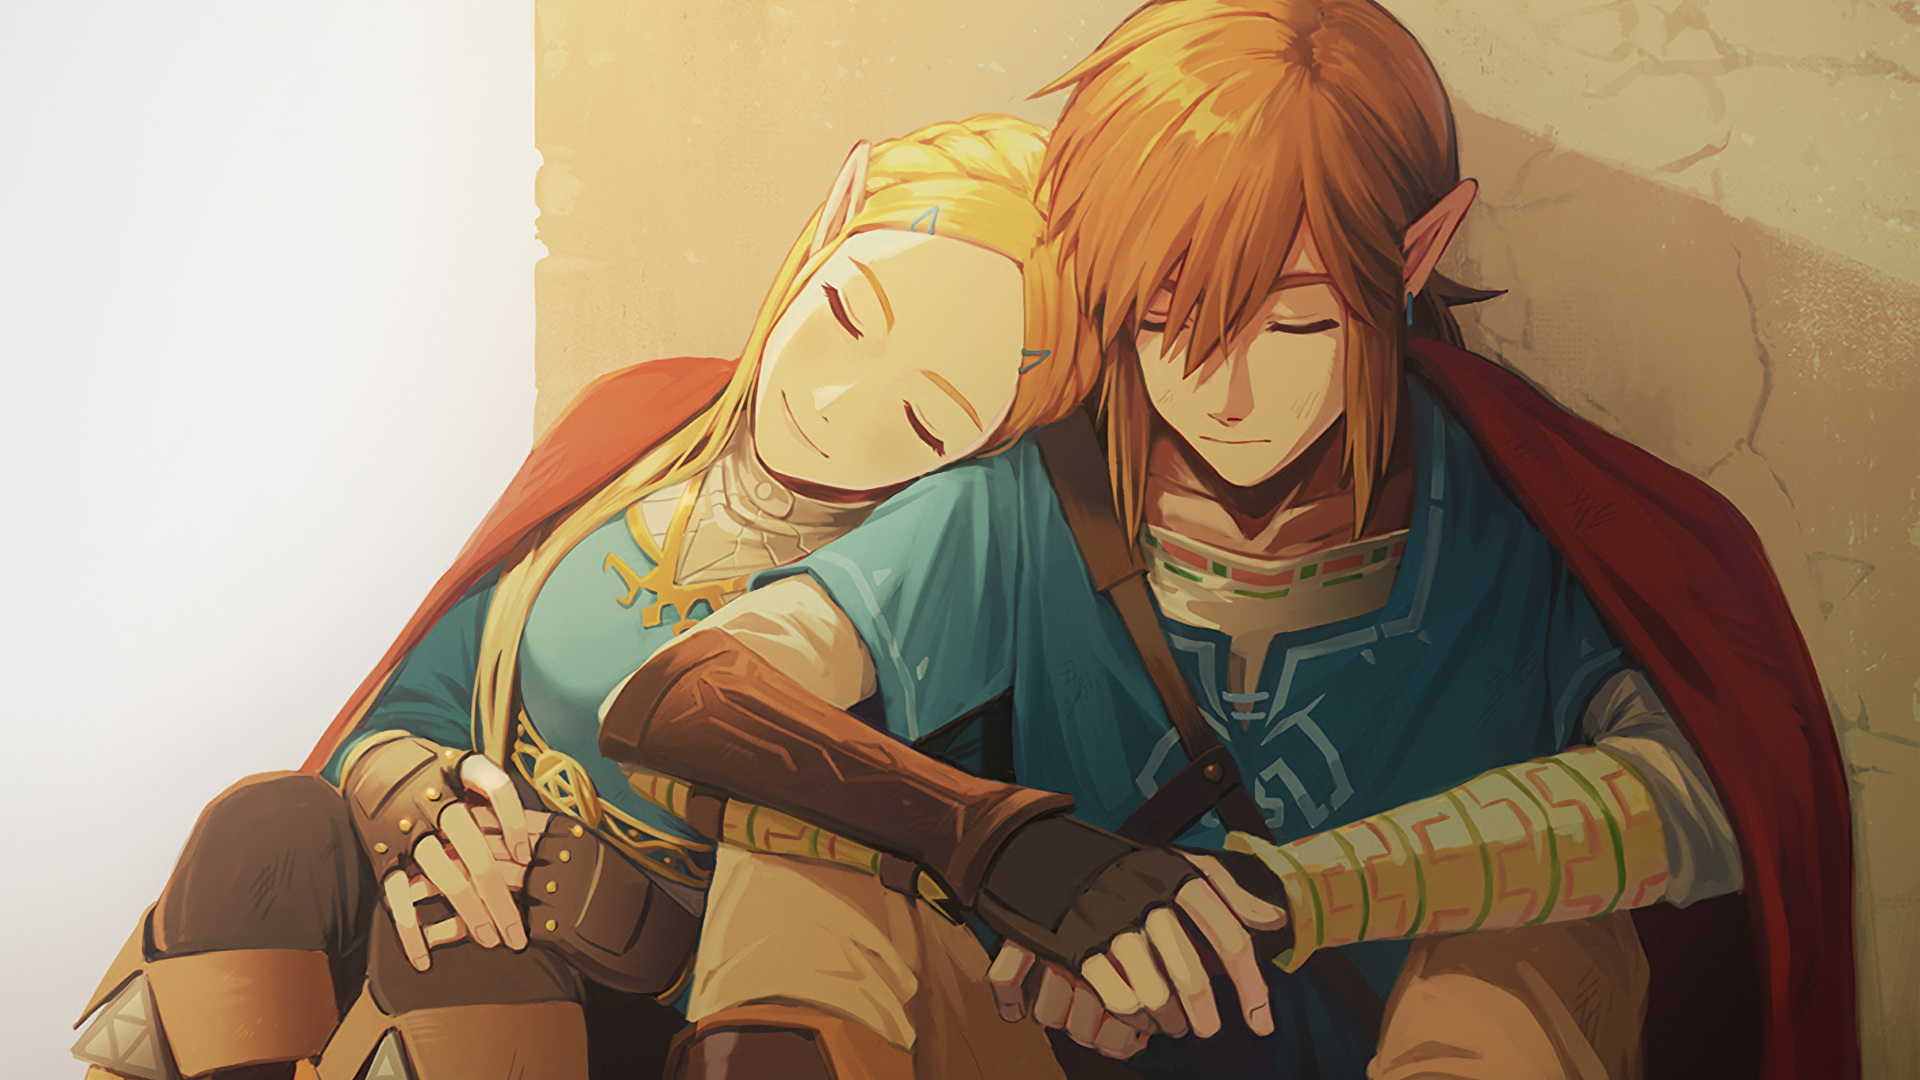 Link And Zelda In The Legend Of